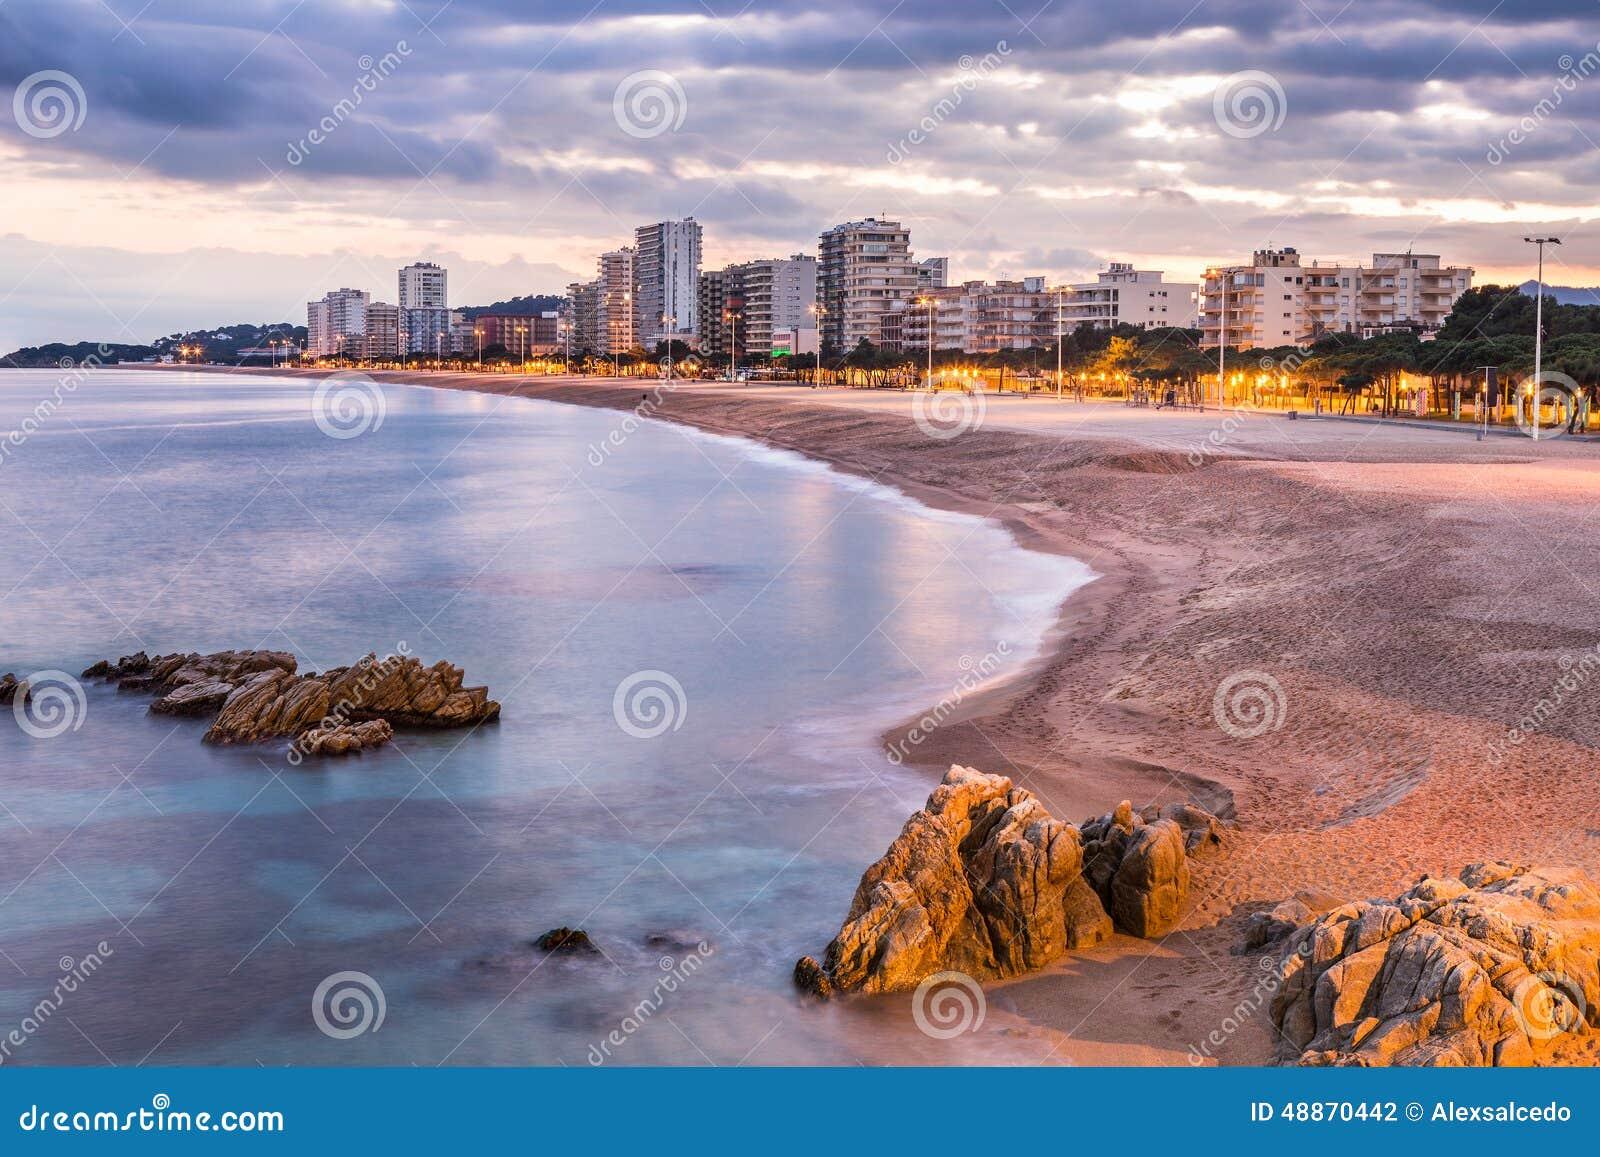 Playa De Aro Spain  city photos gallery : Playa de aro beach landscape, Costa Brava. Spain.